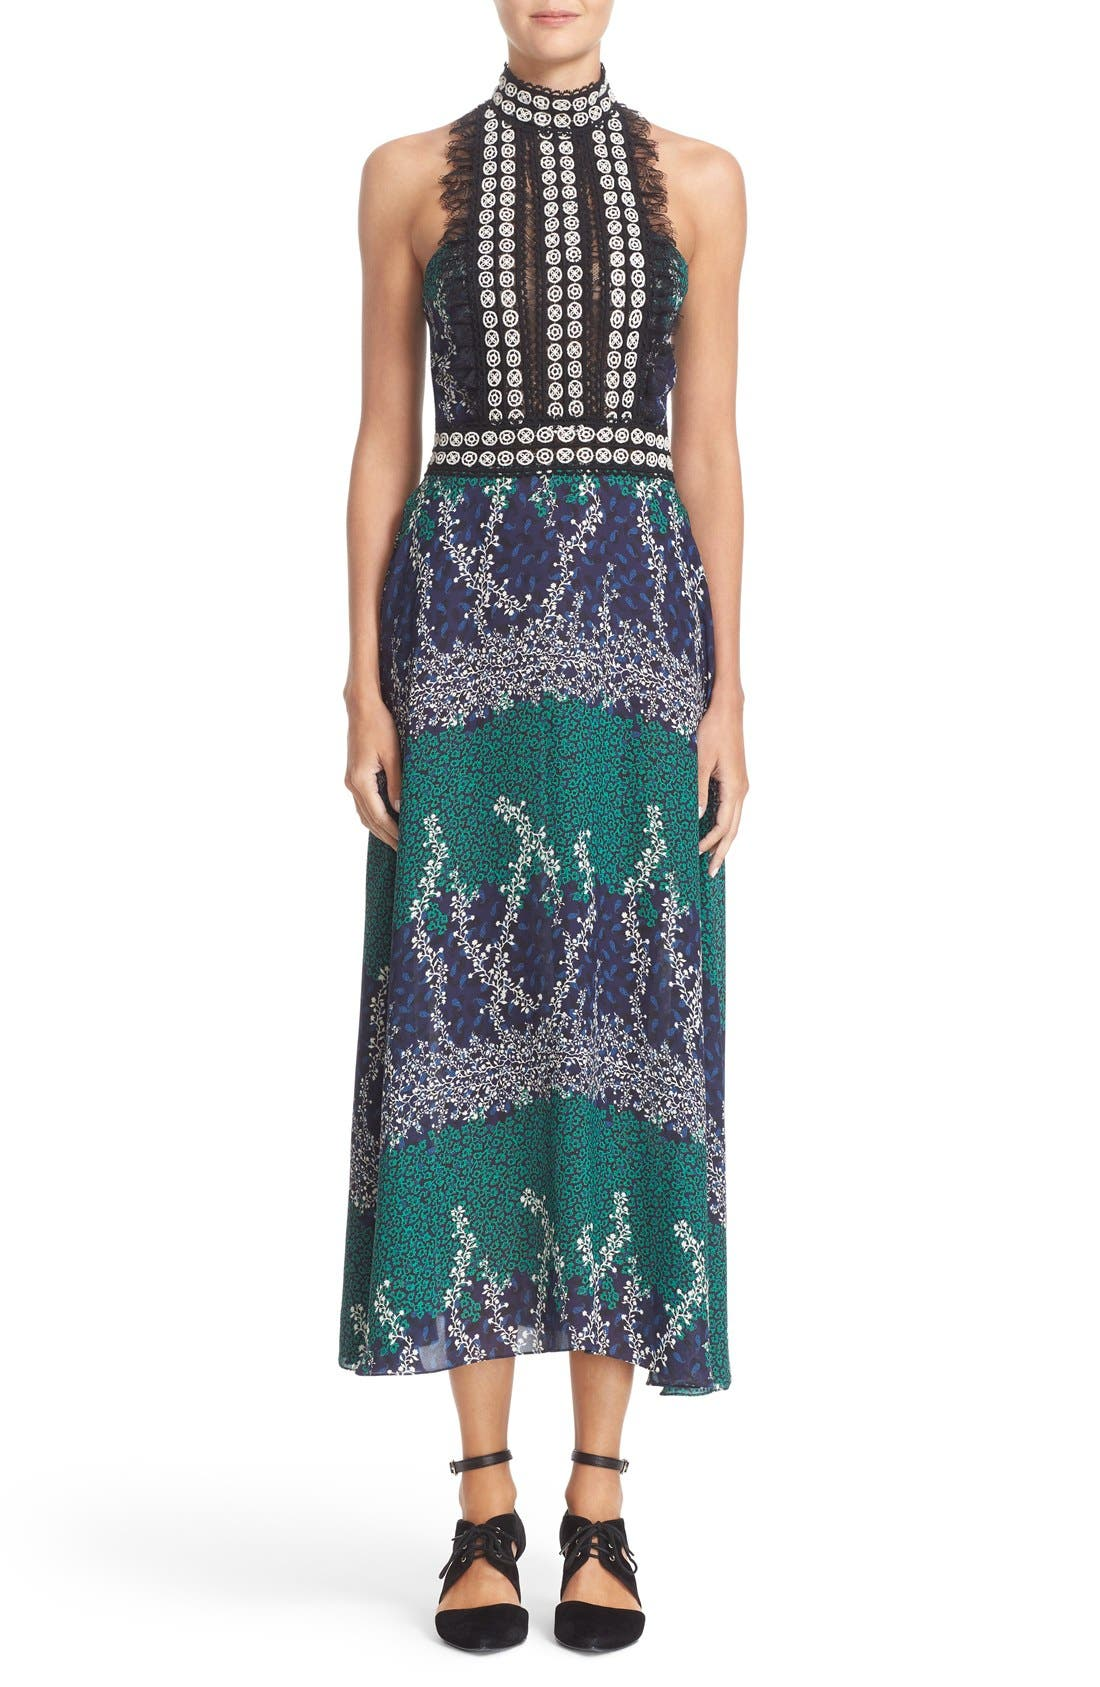 Alternate Image 1 Selected - Yigal Azrouël Lace Trim Ivy & Paisley Print Maxi Dress